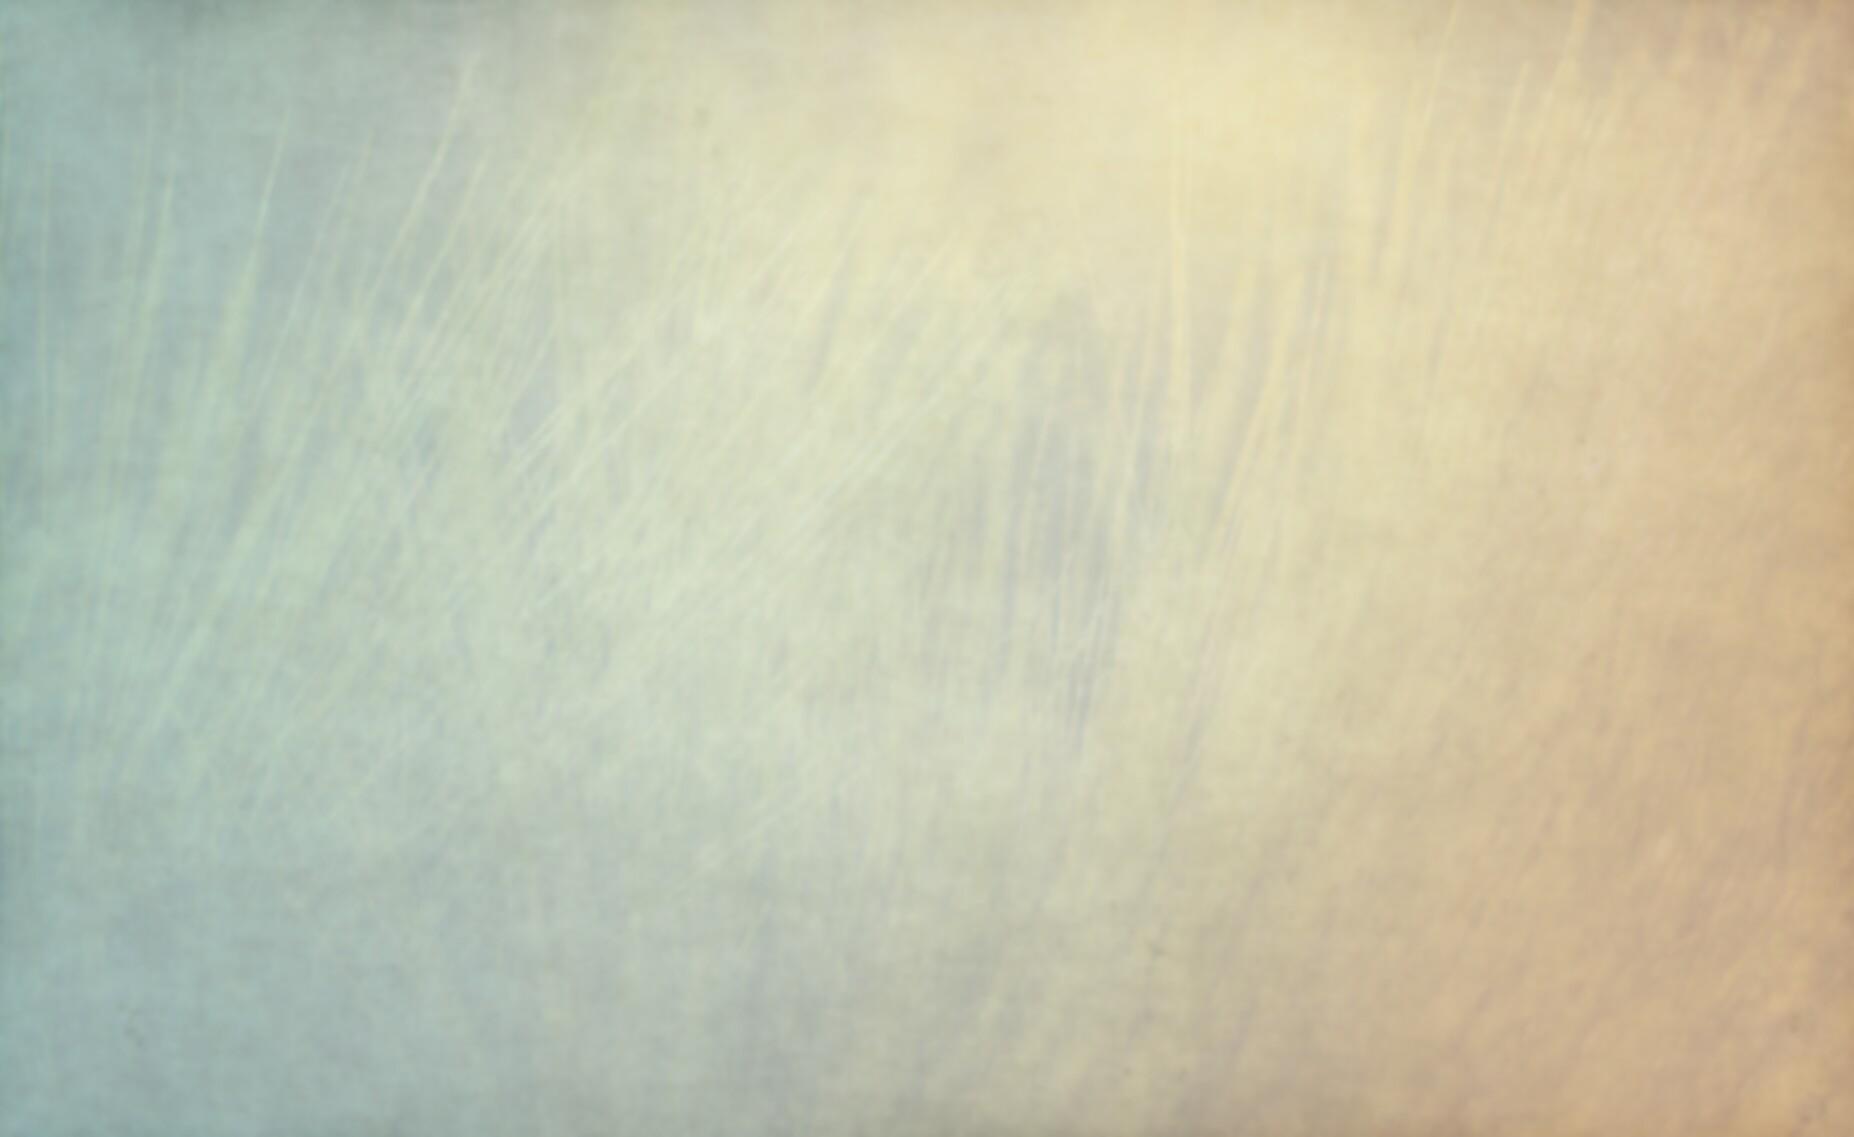 FPH-81: Subtle Wallpapers, Pictures of Subtle FHDQ, 41 Beautiful